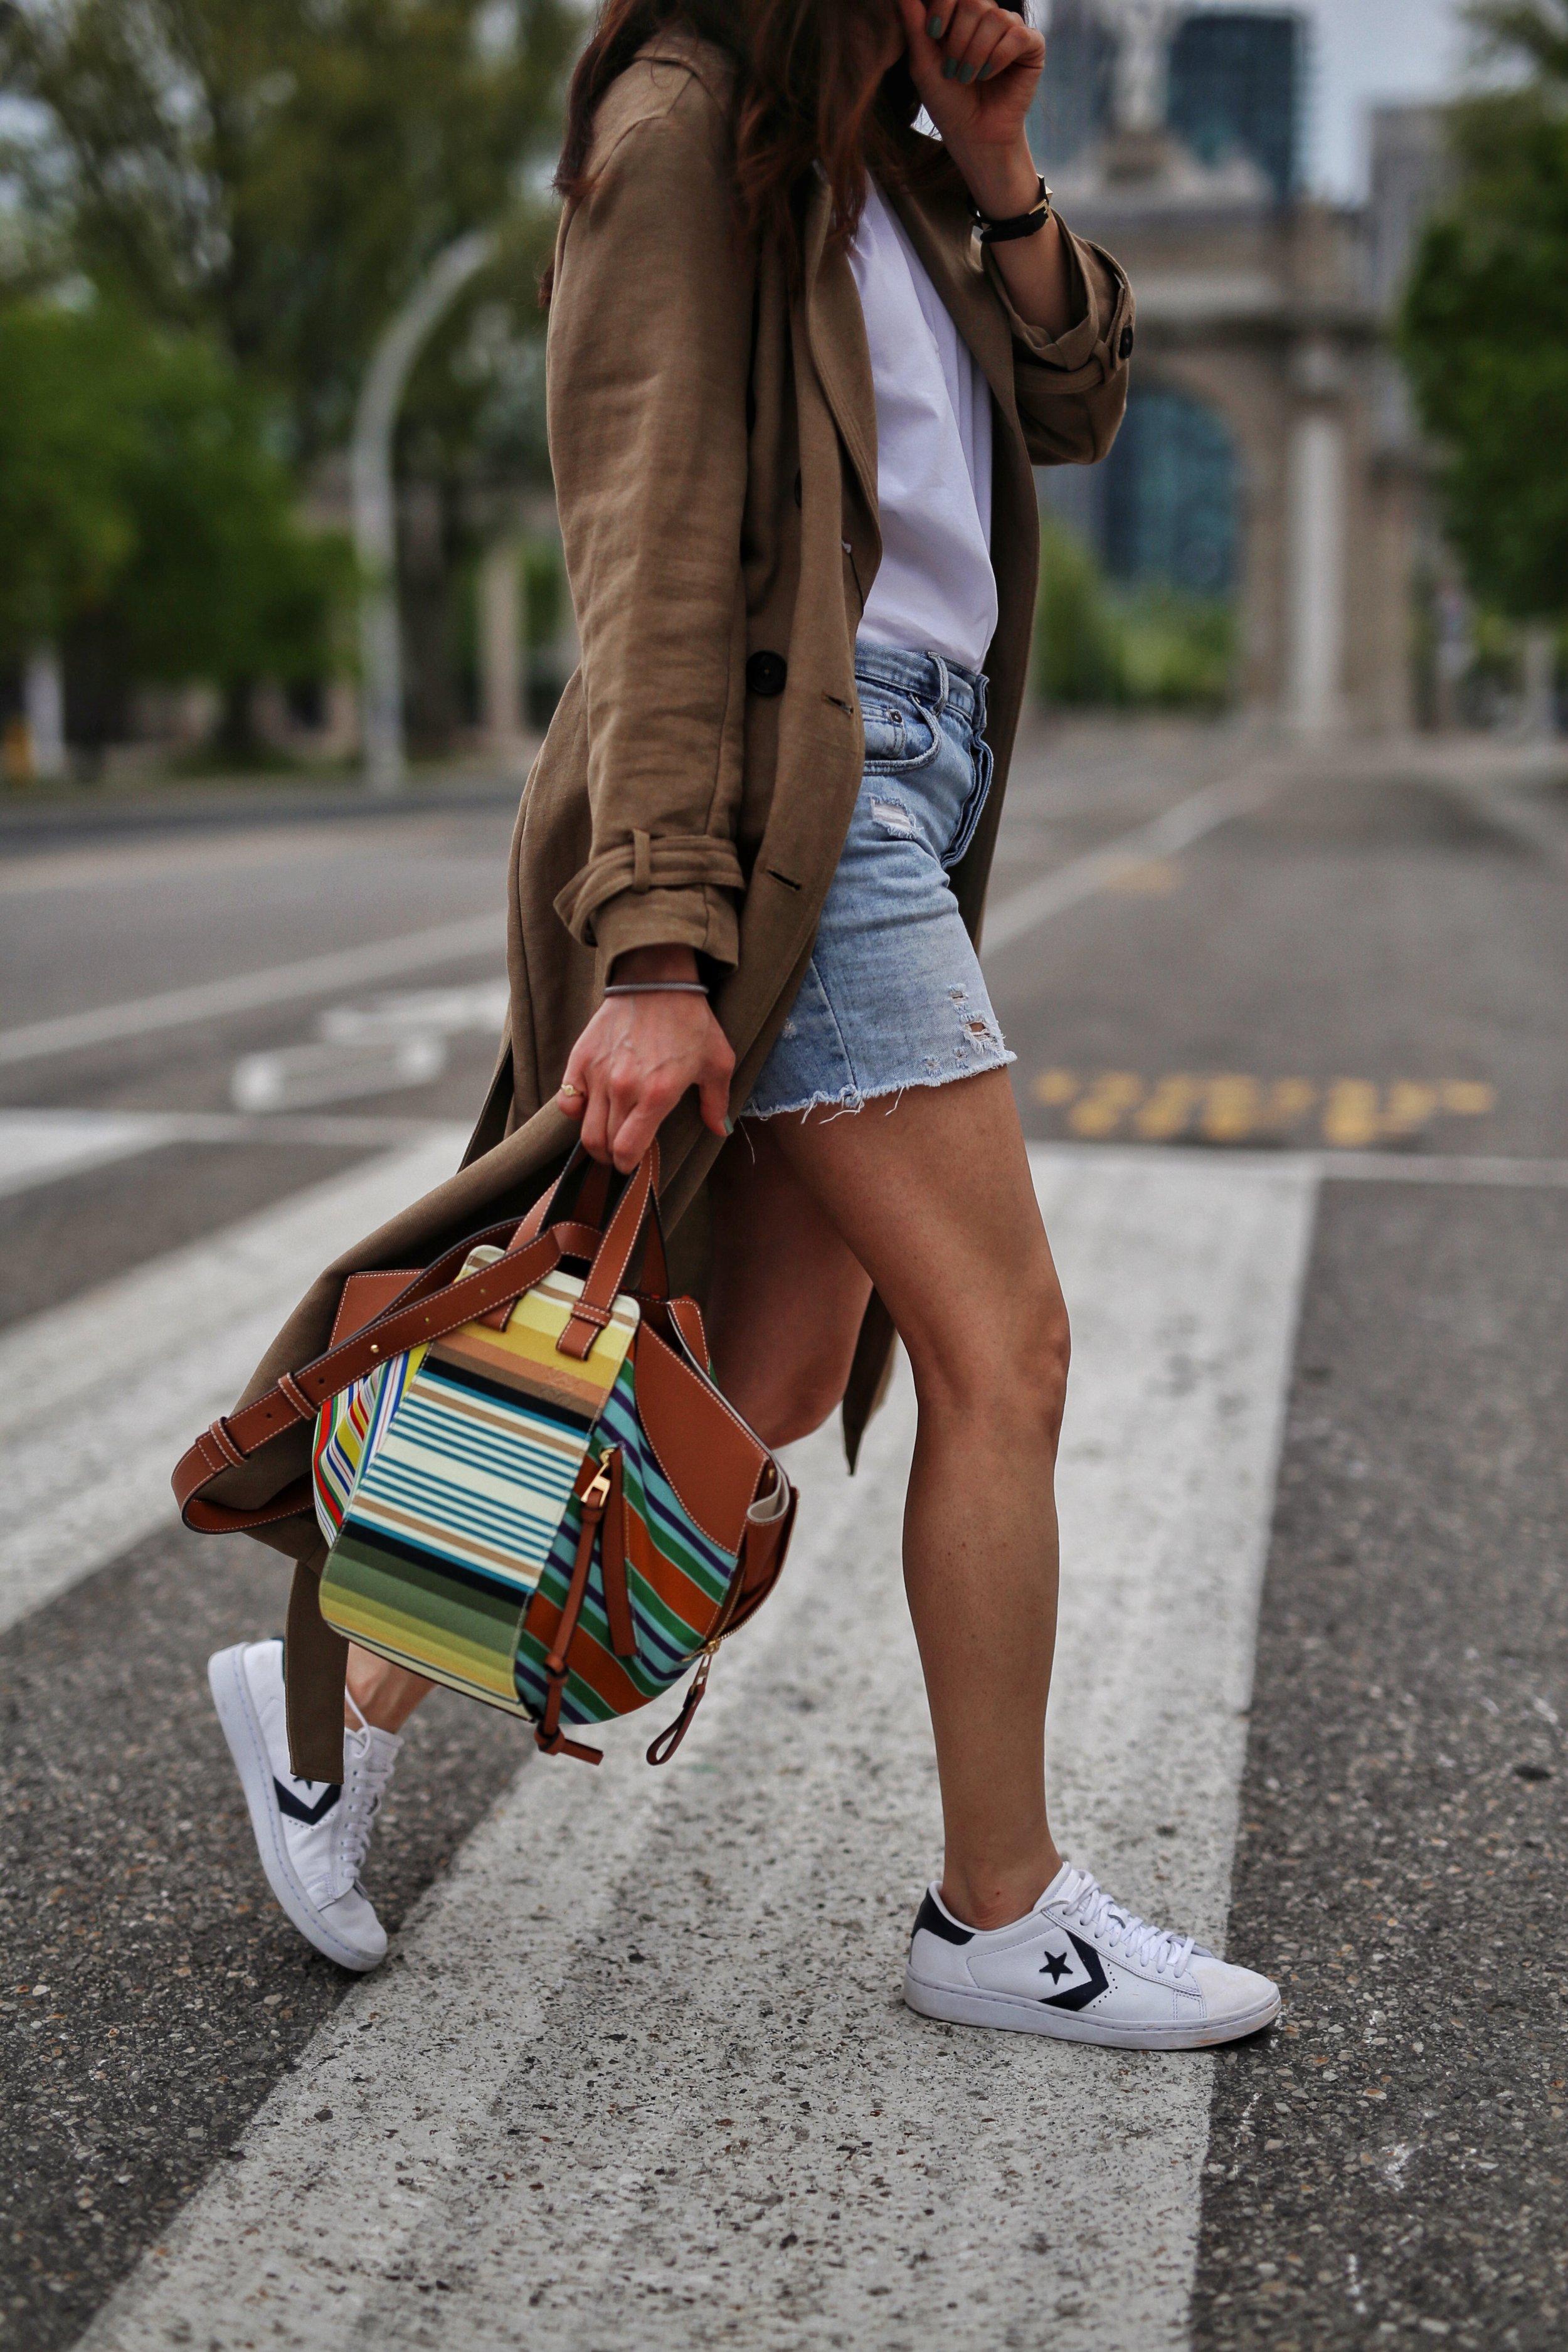 woahstyle.com 2018 - zara linen trench coat, free people cut off shorts, converse one stars, loewe striped small hammock bag, white button up shirt - toronto street style - hotel x - nathalie martin 13.jpg